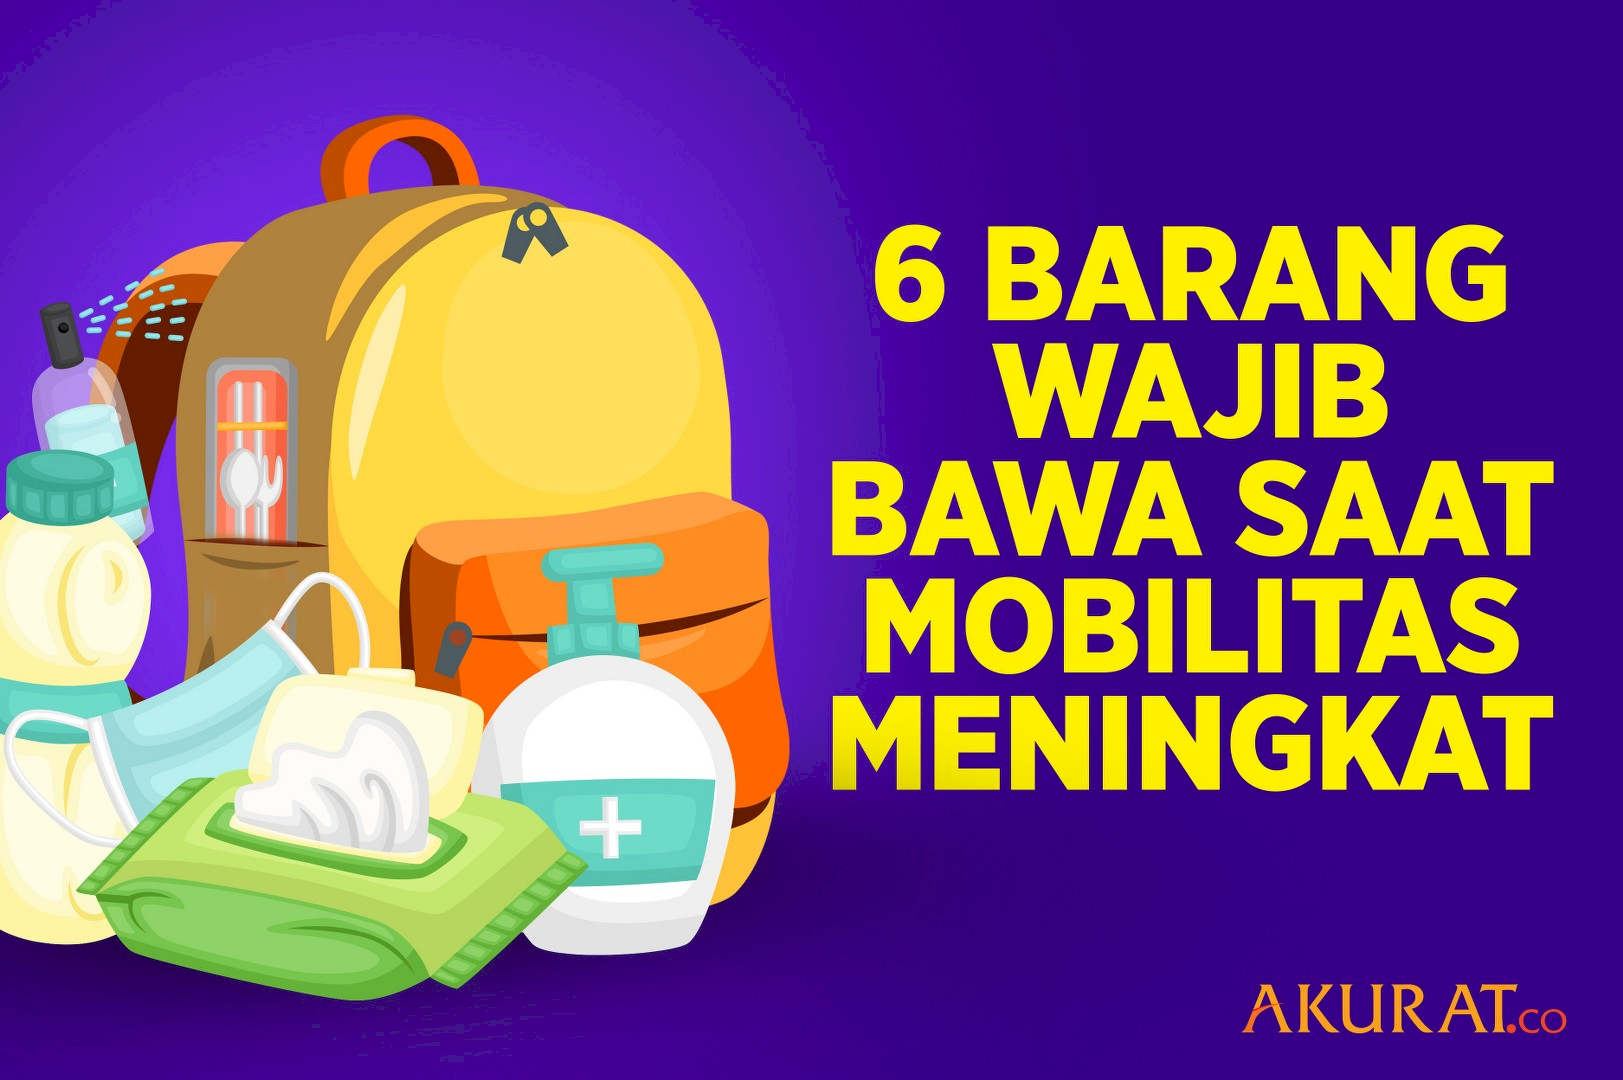 6 Barang Wajib Bawa Saat Mobilitas Meningkat